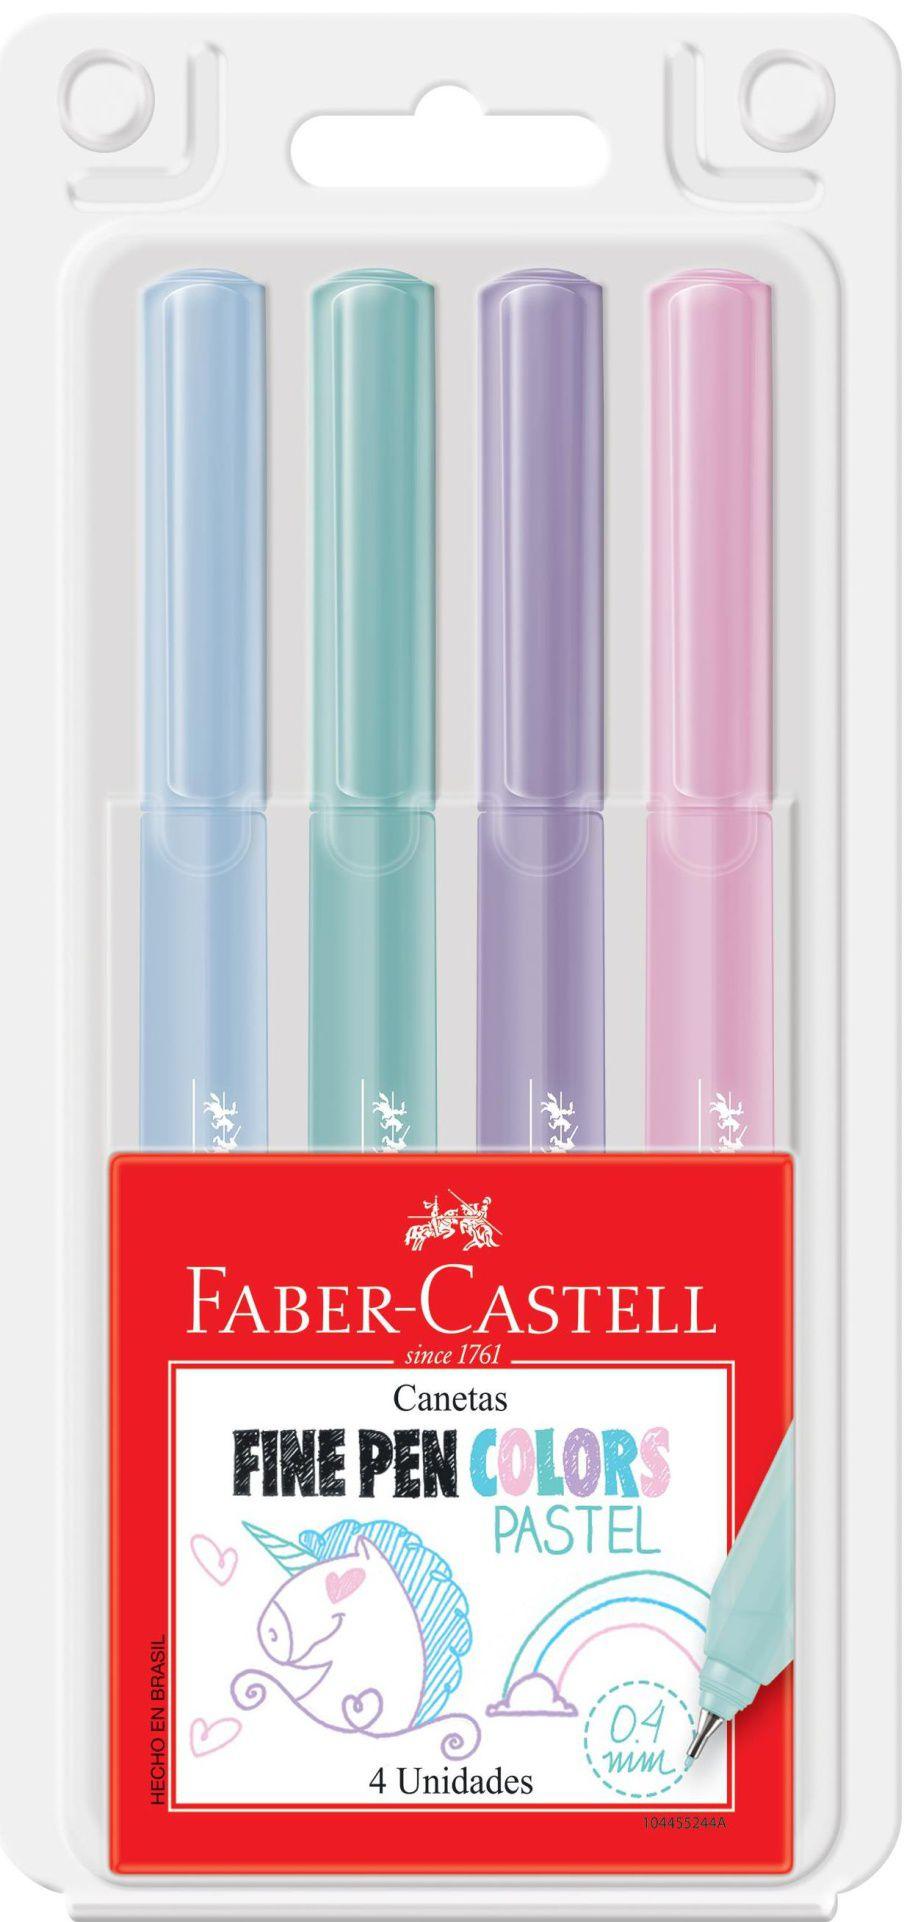 Caneta Fine Pen Tons Pasteis Faber Castell 4 Cores